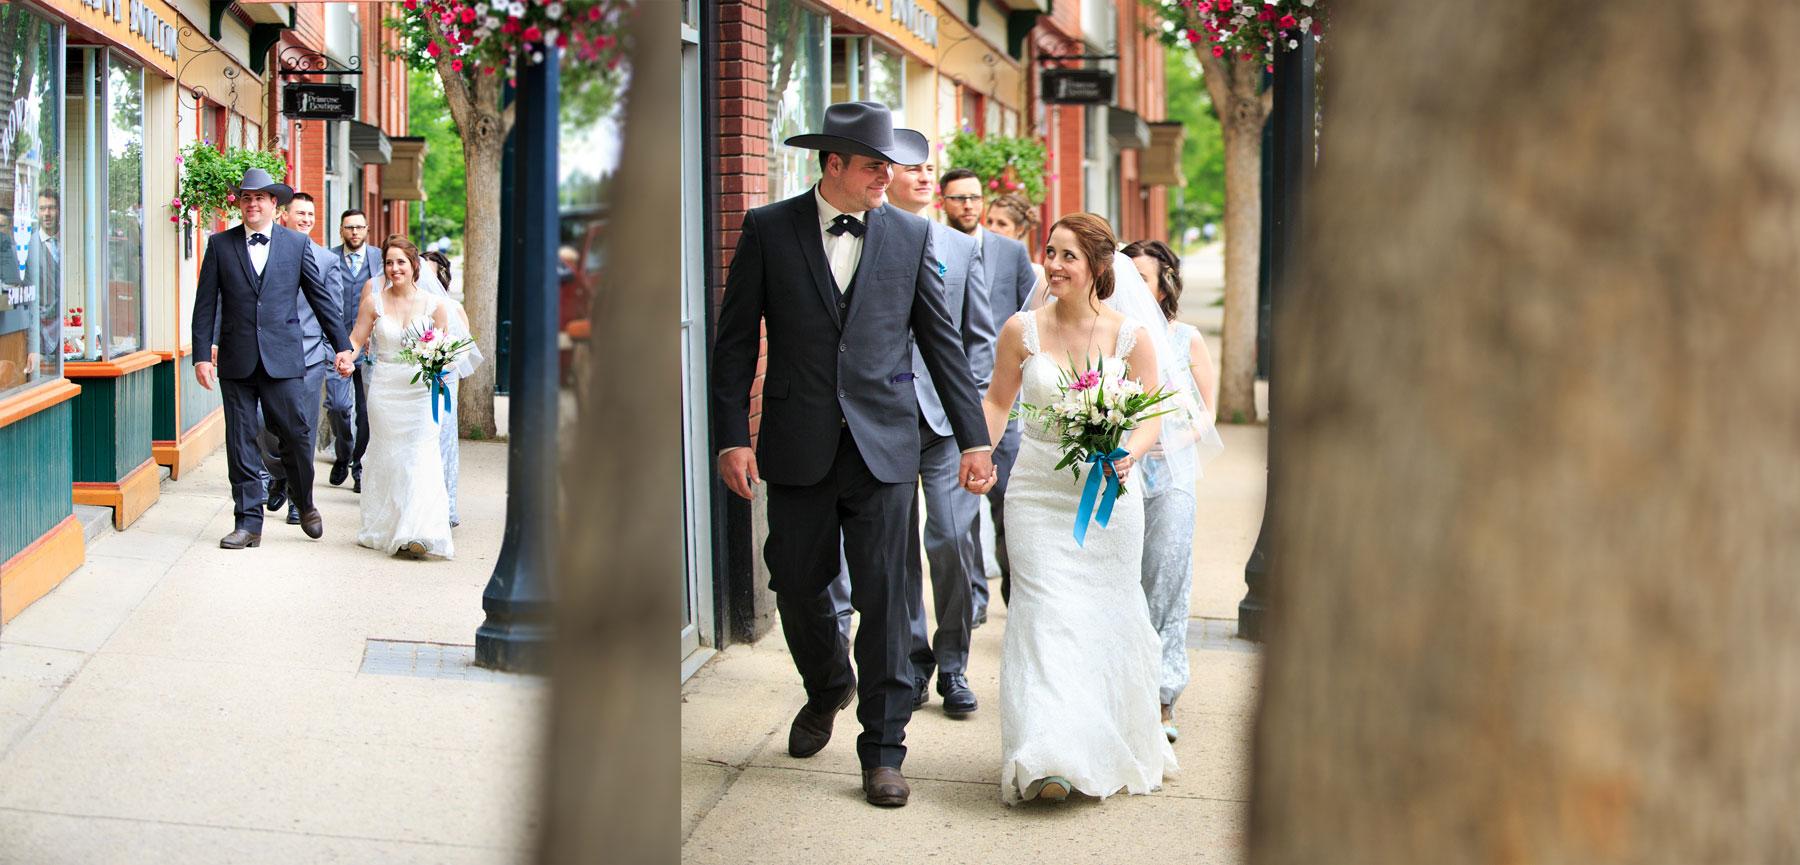 Angela & Patrick - Lacombe, Alberta Wedding Photography - Olson Studios (16)